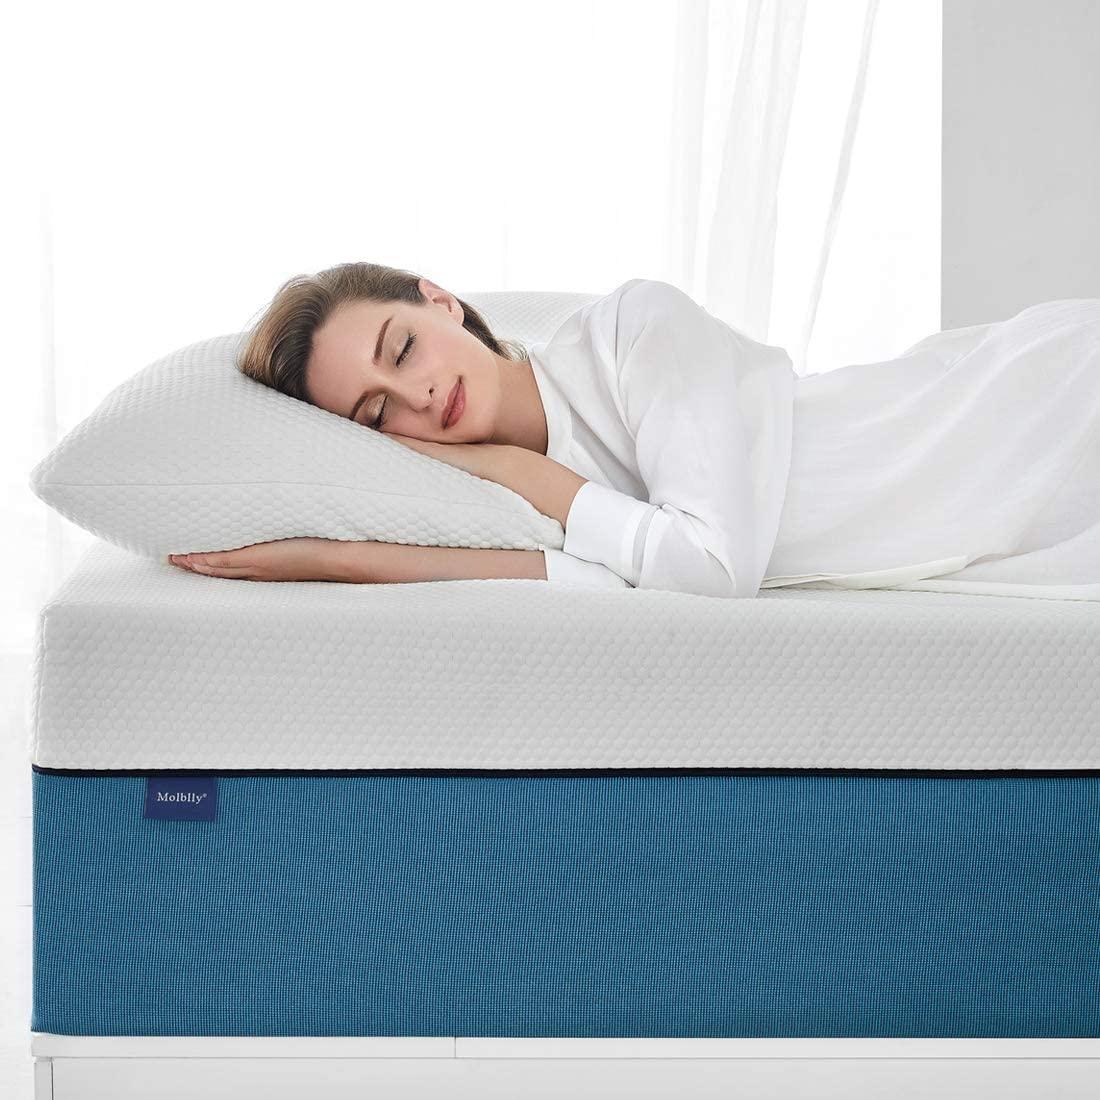 Molblly 10 inch Cooling-Gel Memory Foam Mattress in a Box